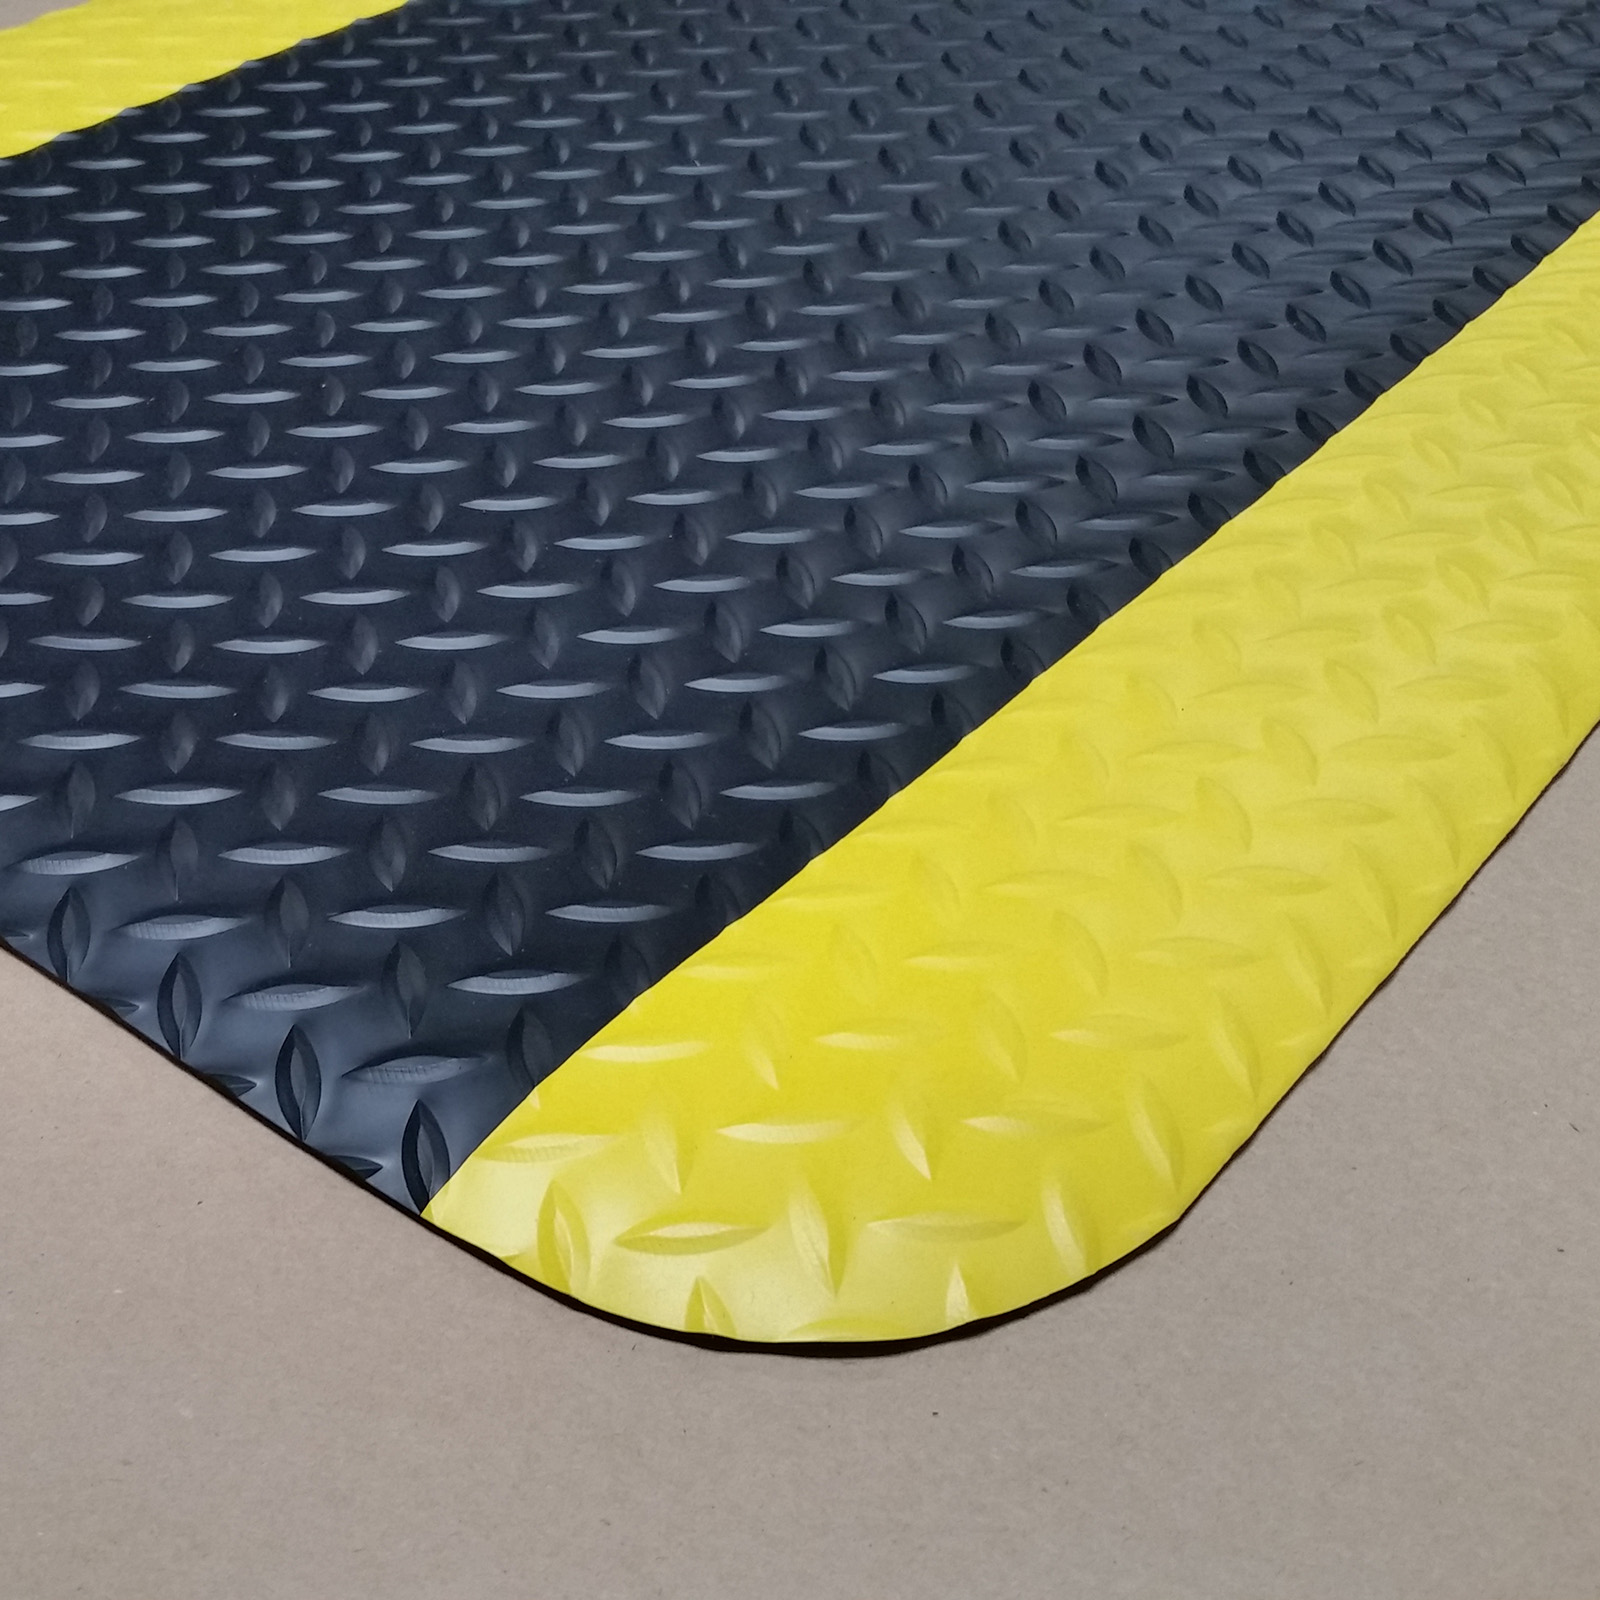 Cactus Mat 1053-35 floor mat, anti-fatigue